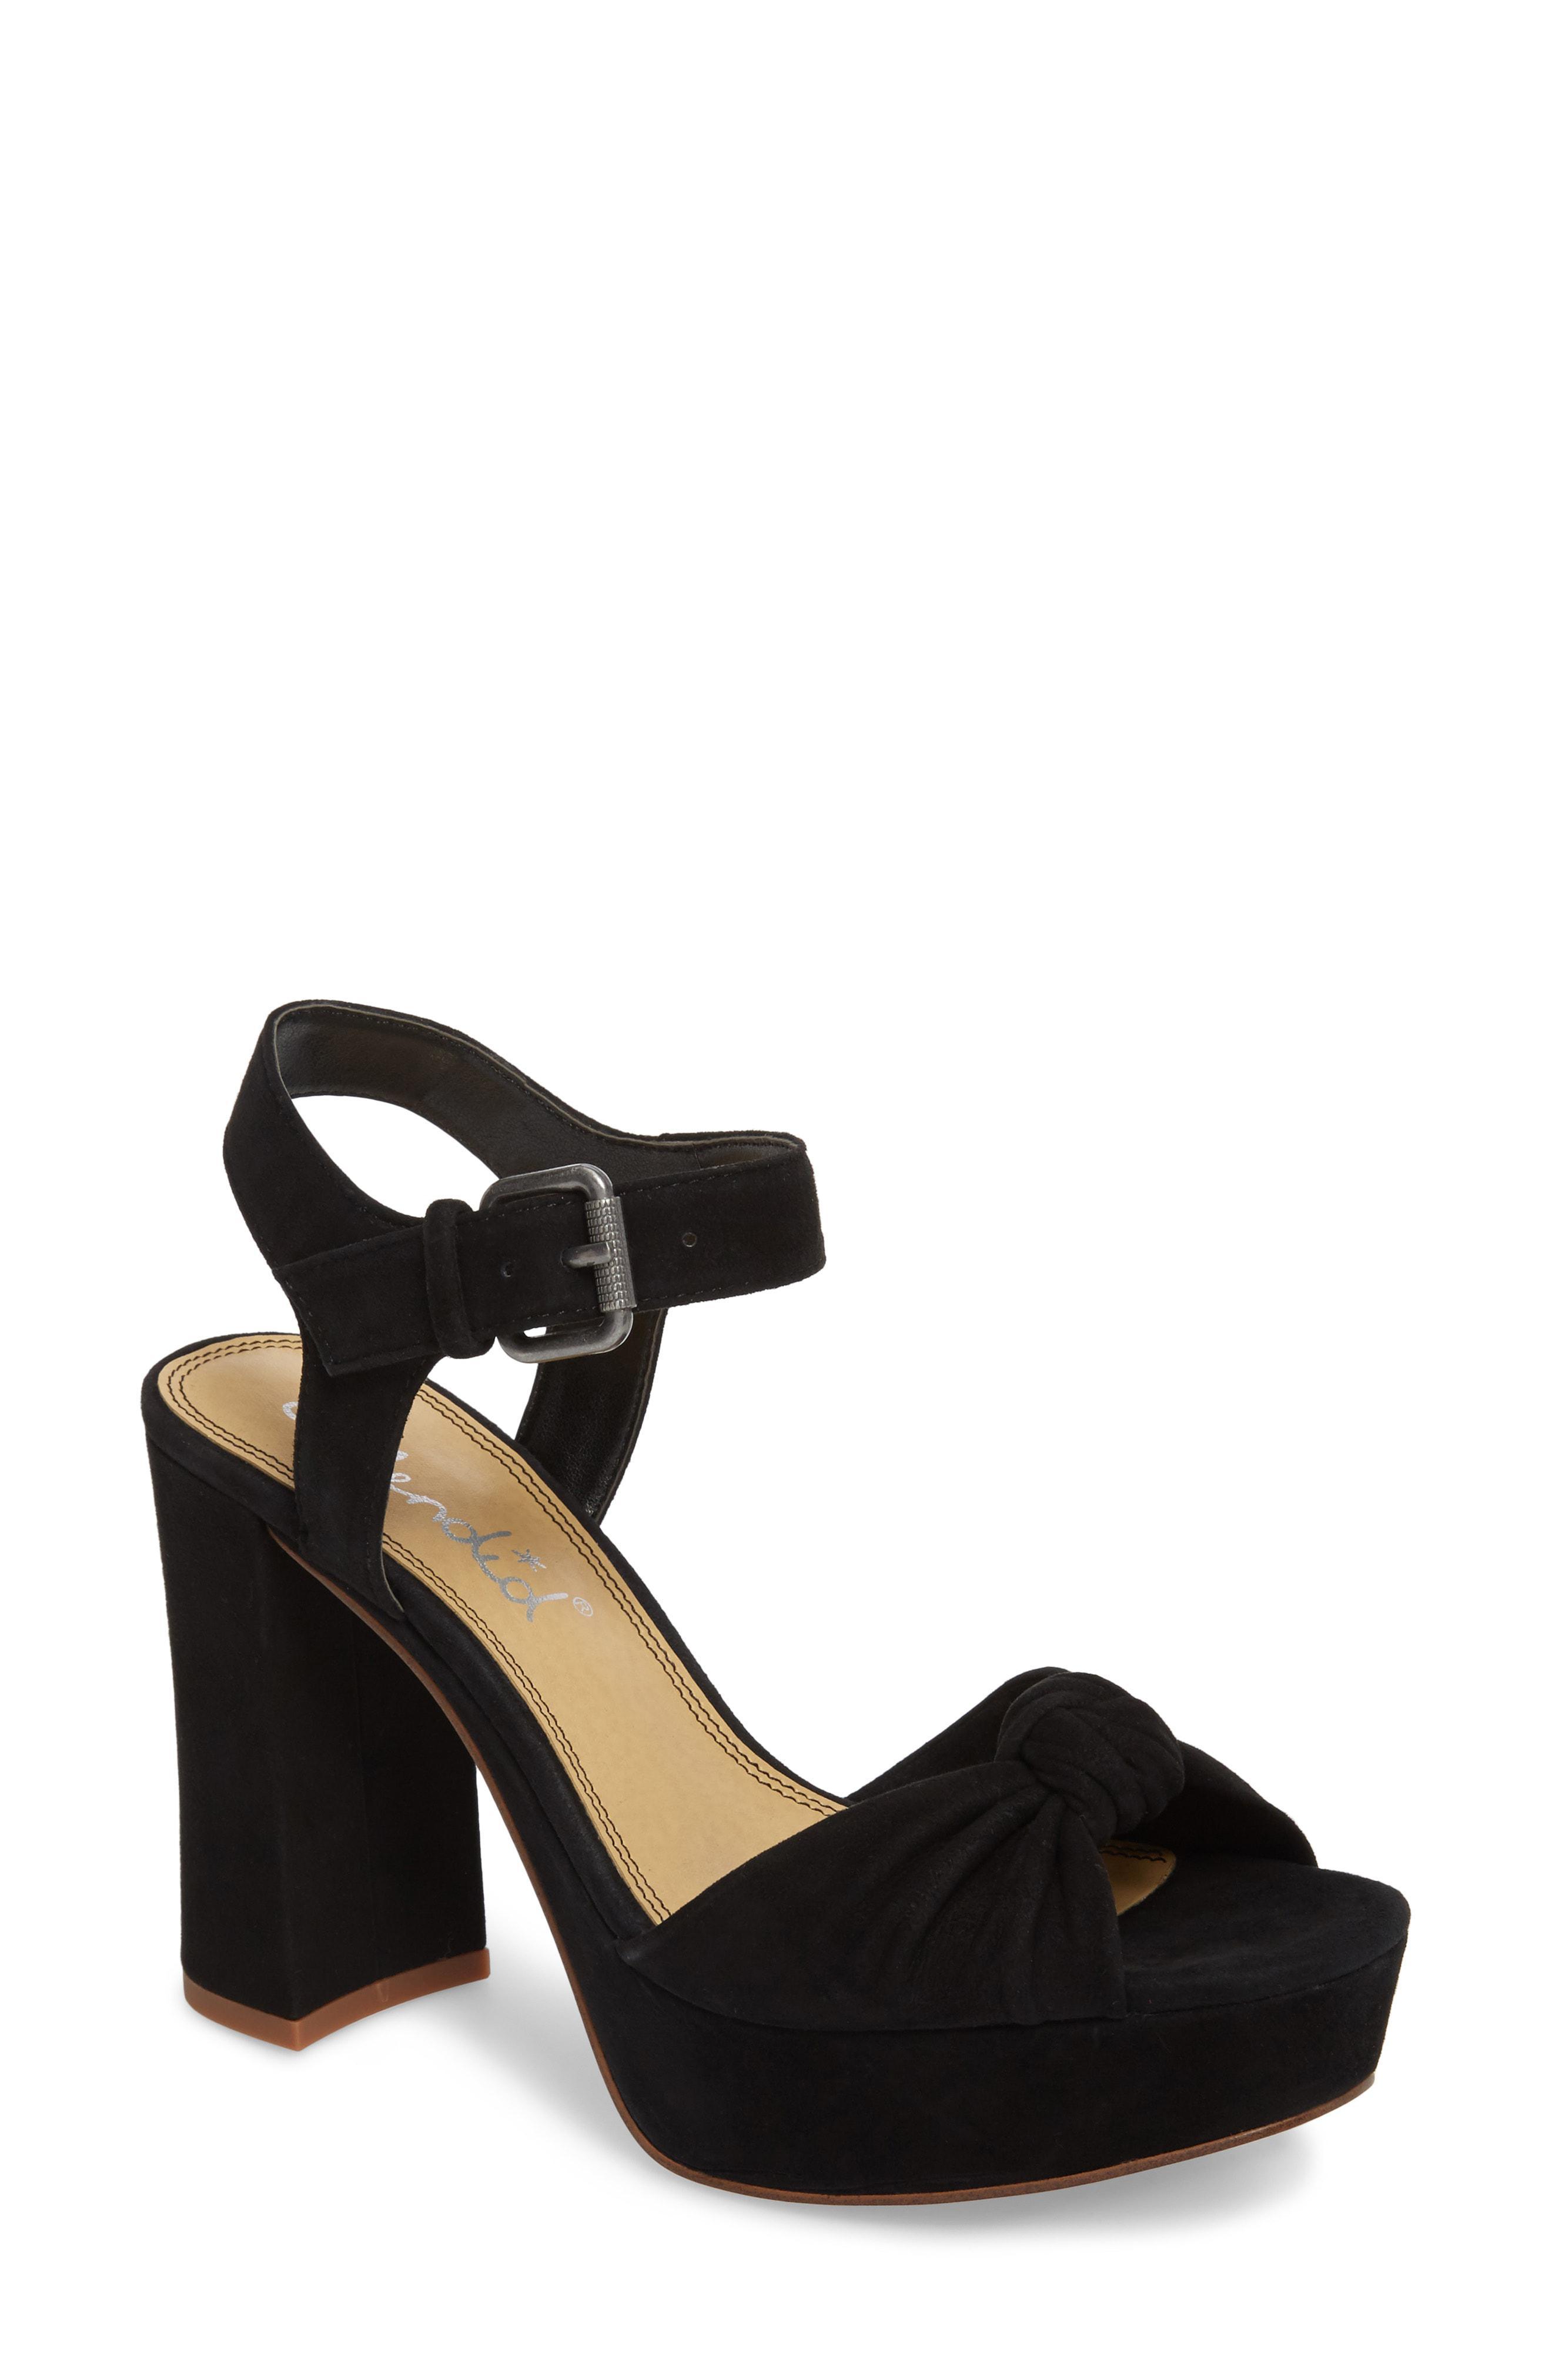 7721c7c13988 Lyst - Splendid Bates Platform Sandal in Black